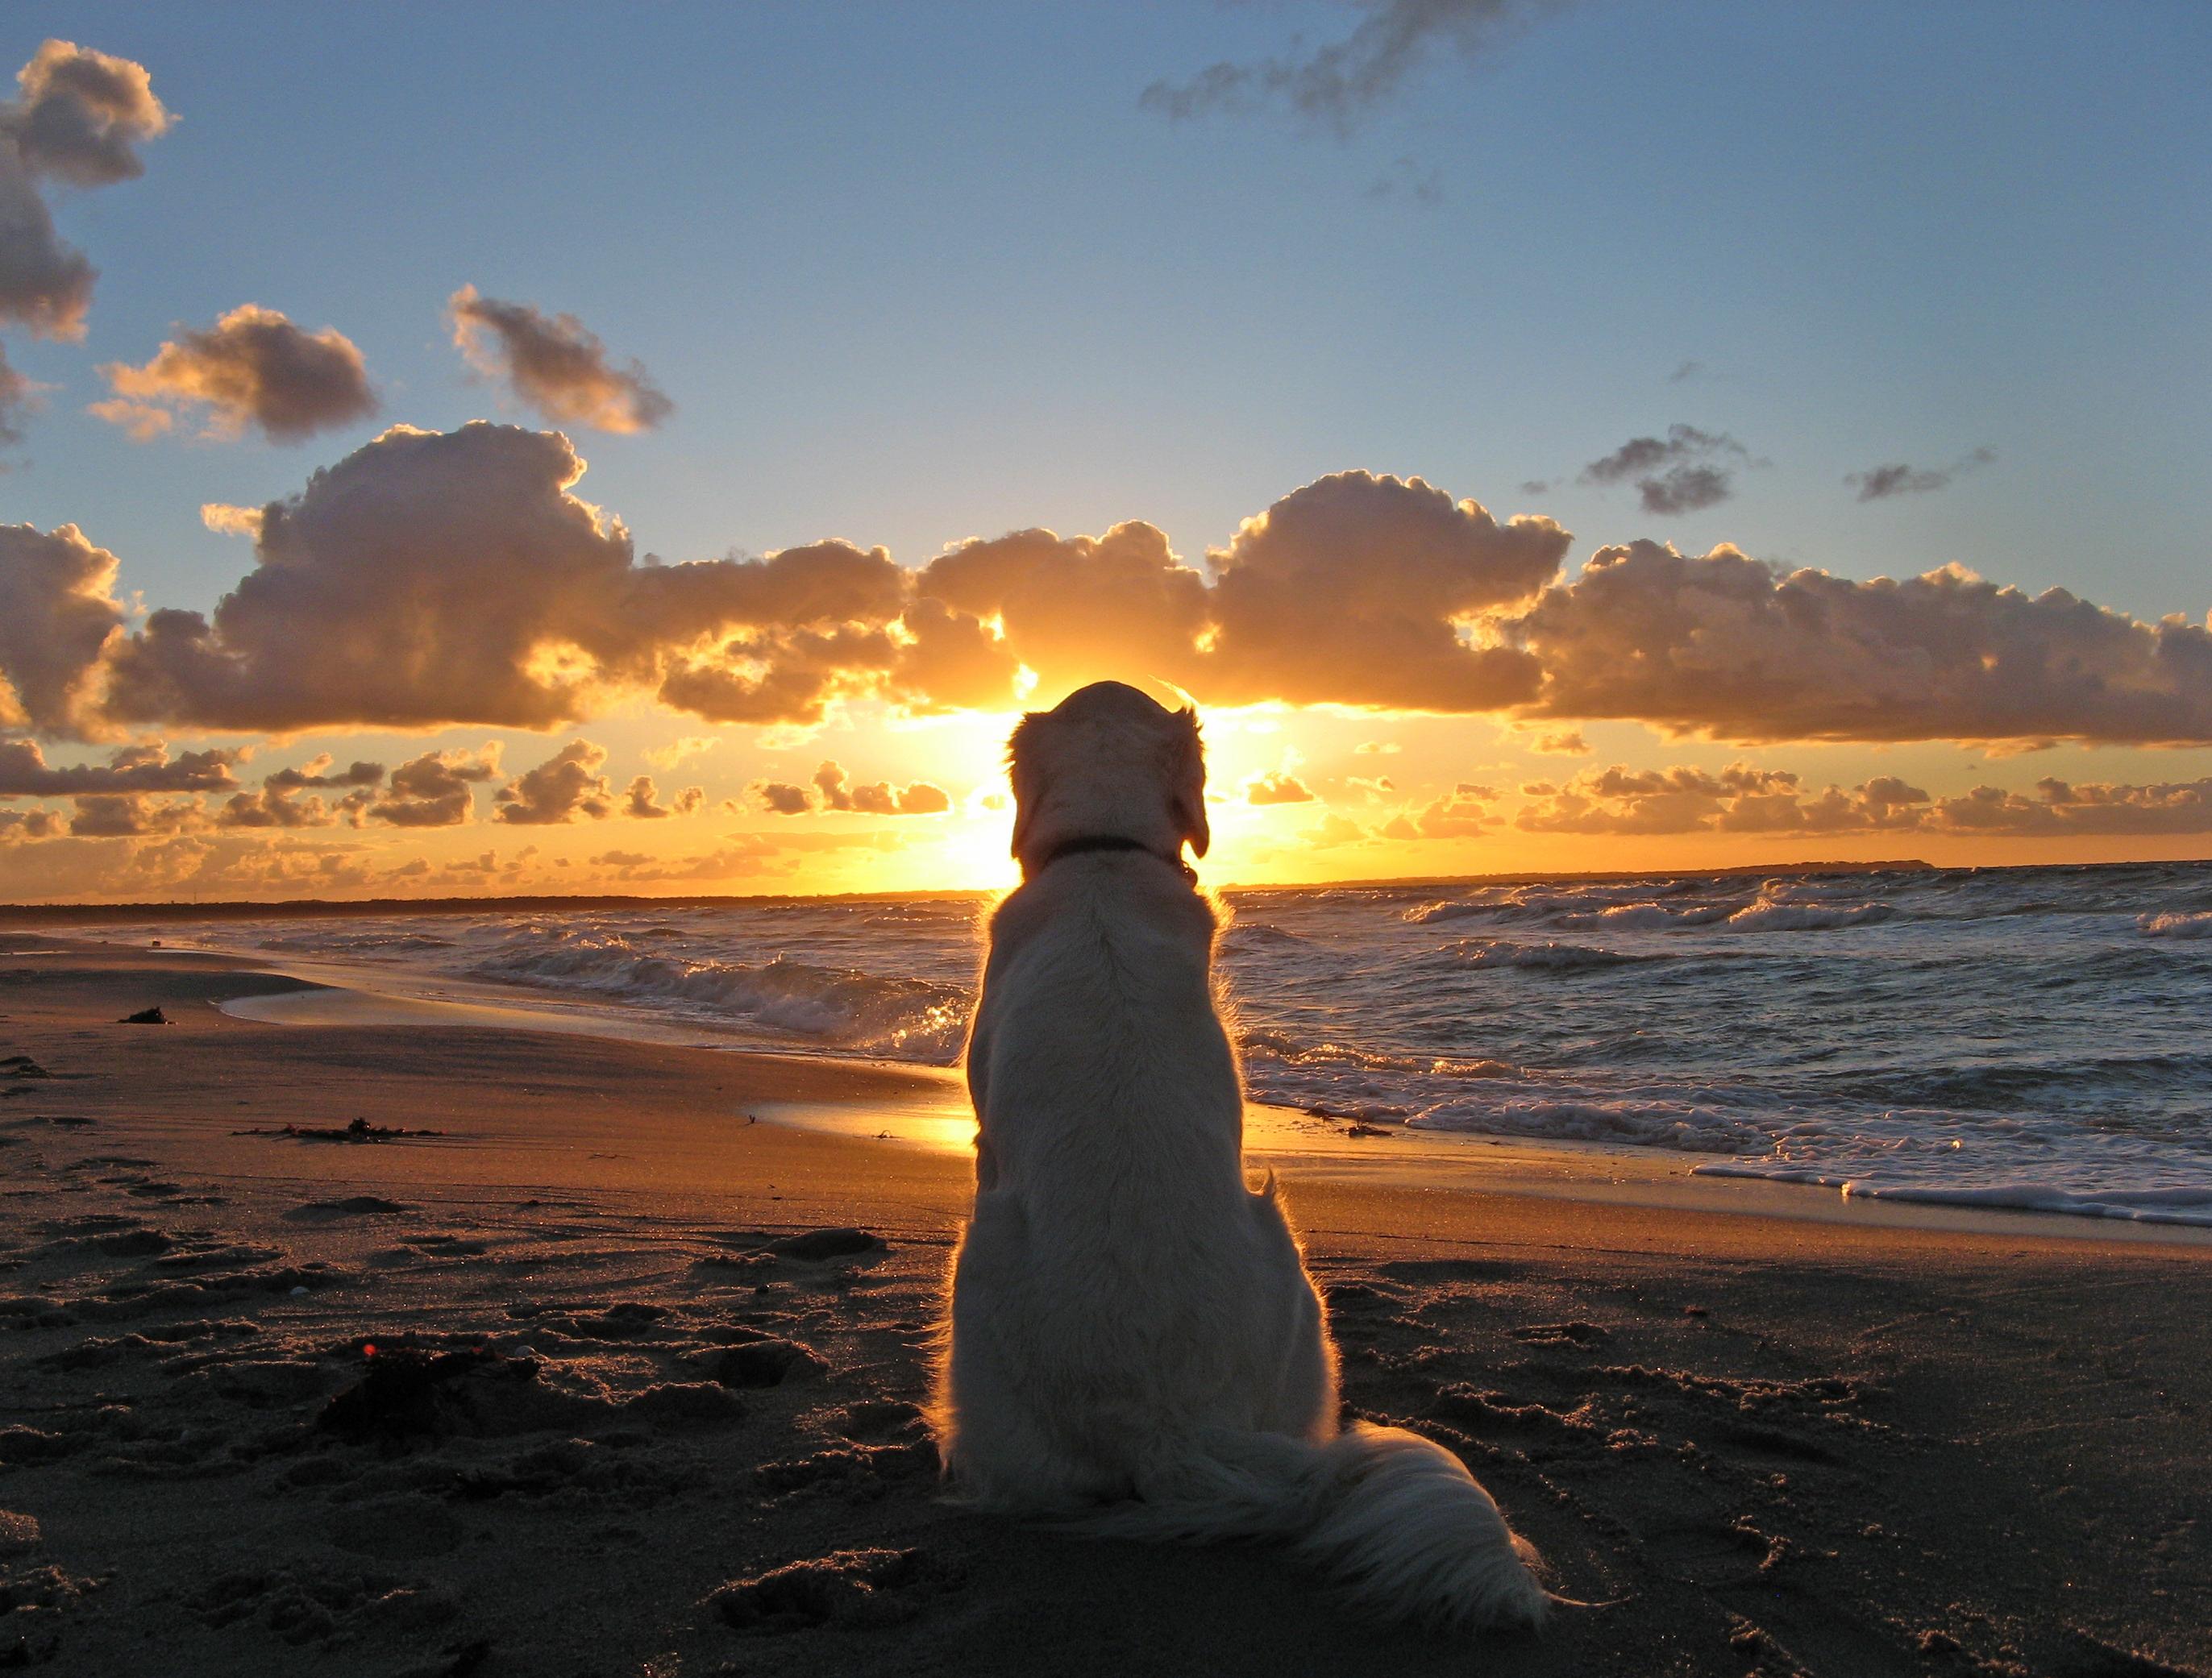 Фото меня на берегу моря вариант